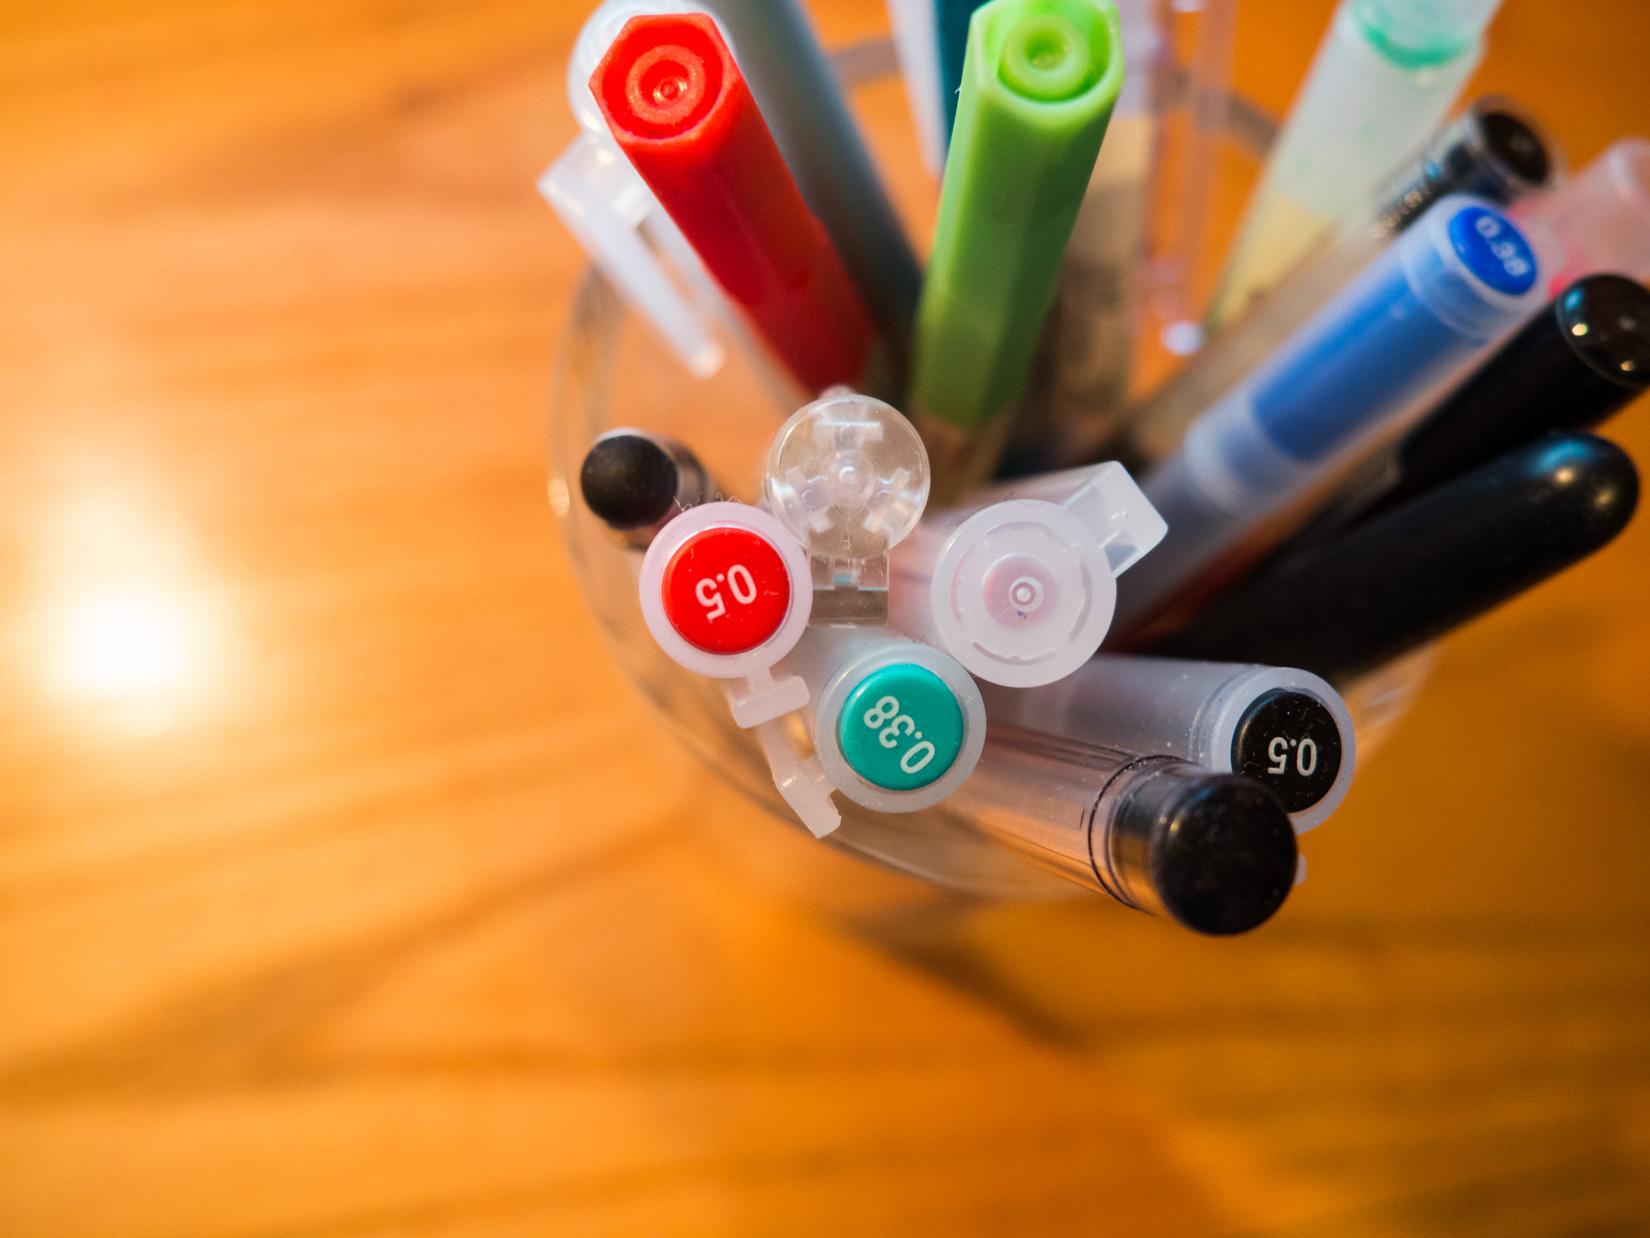 Pens on Desk